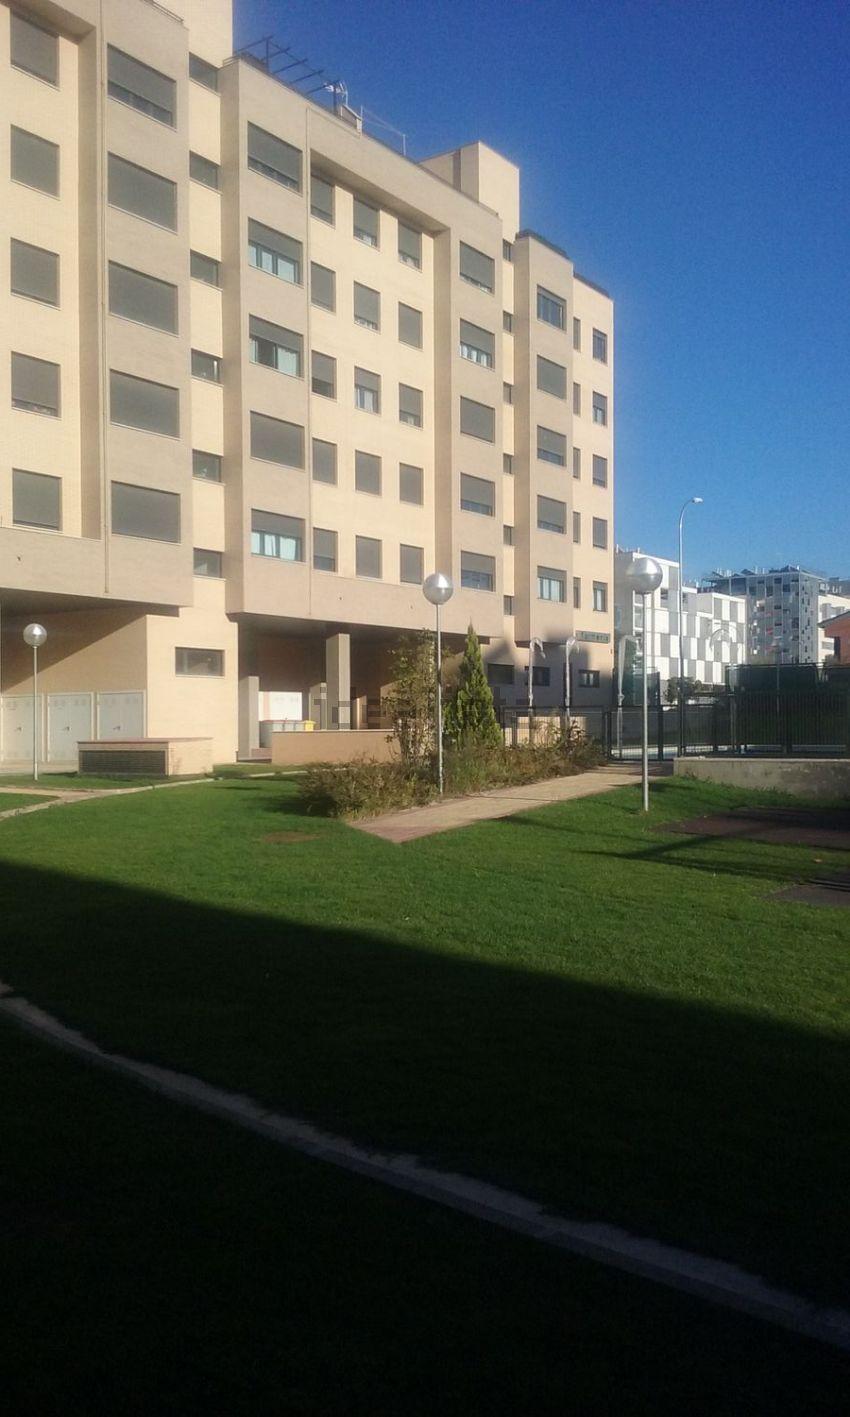 Piso en calle GRANJA SAN ILDEFONSO, 34, Ensanche de Vallecas - La Gavia, Madrid